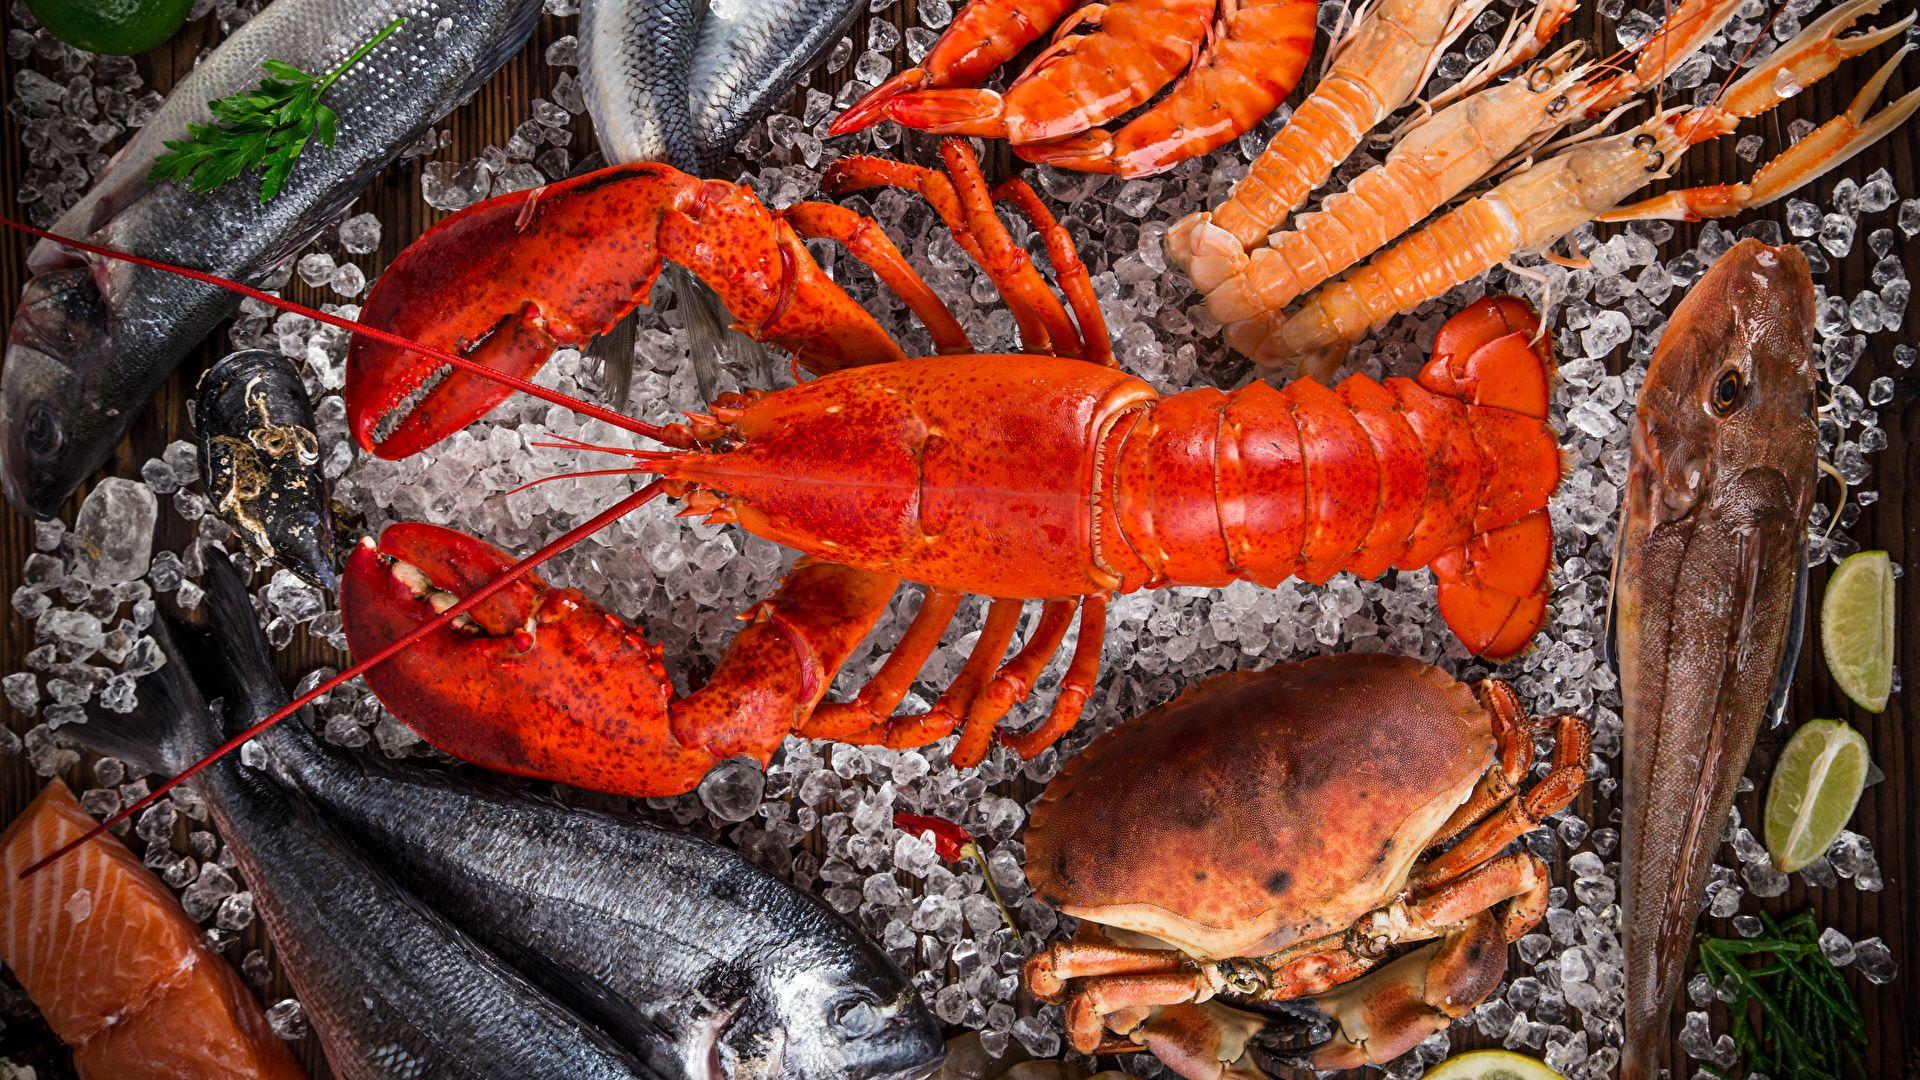 Lobster PC Wallpaper HD